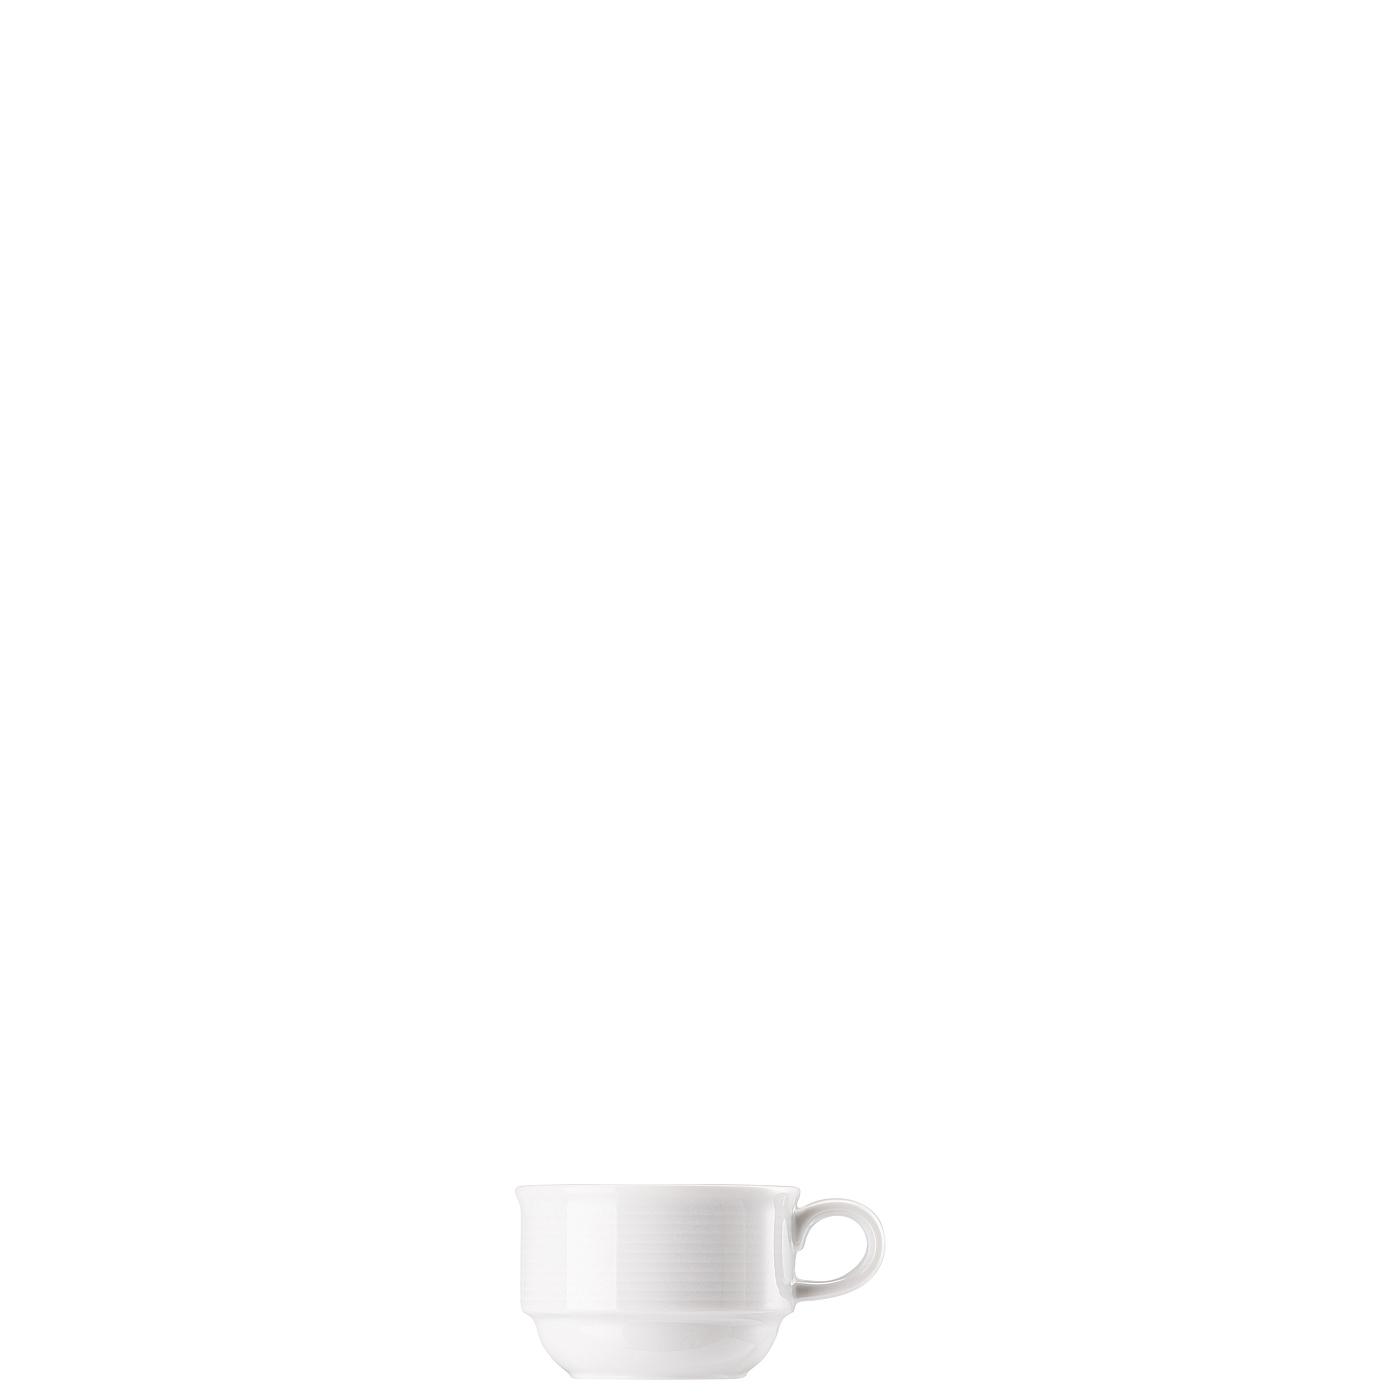 Espresso-Obertasse stapelbar Trend Weiss Thomas Porzellan